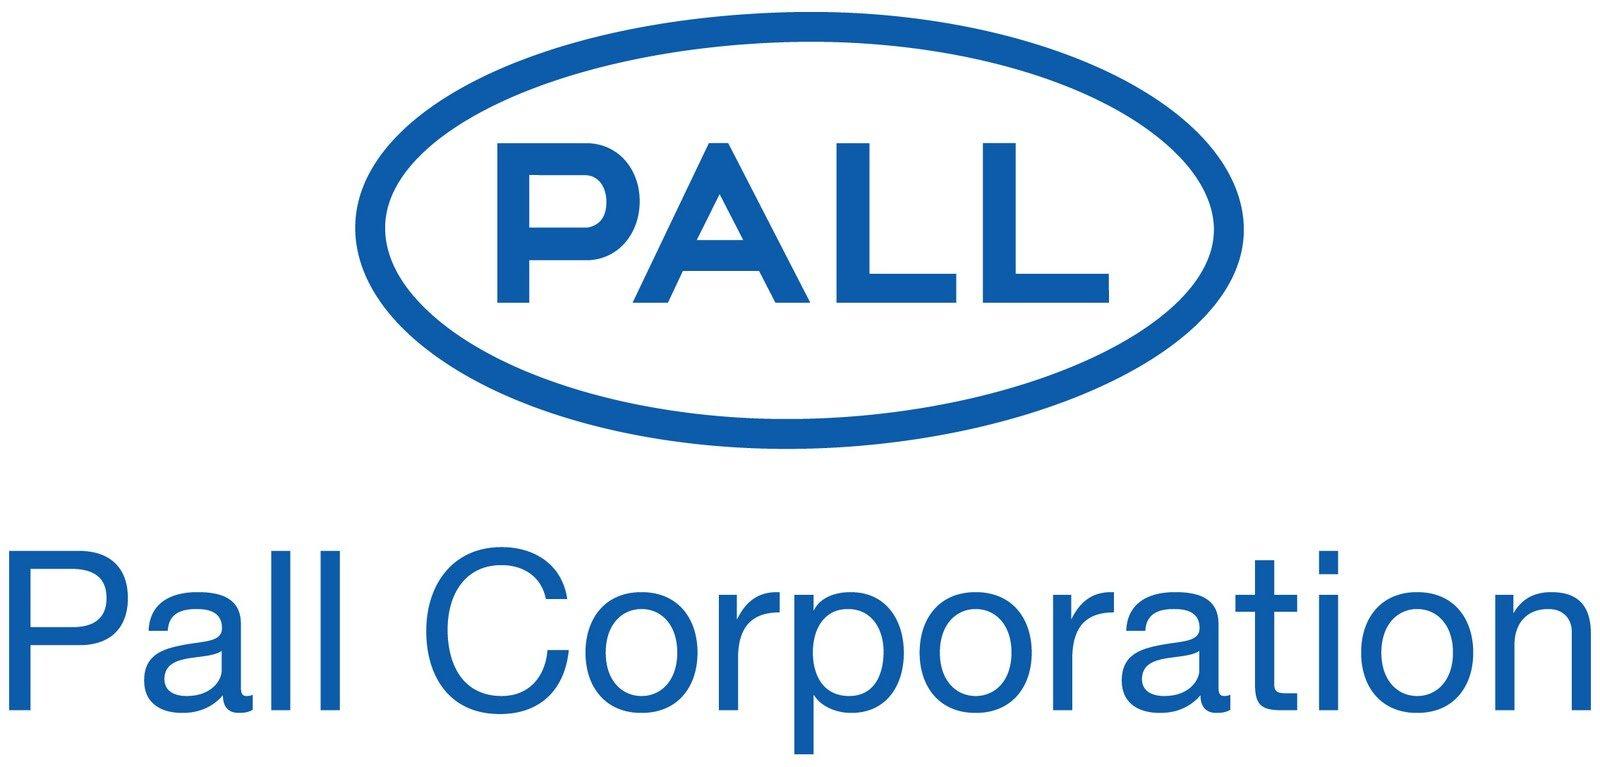 Pall Co. logo